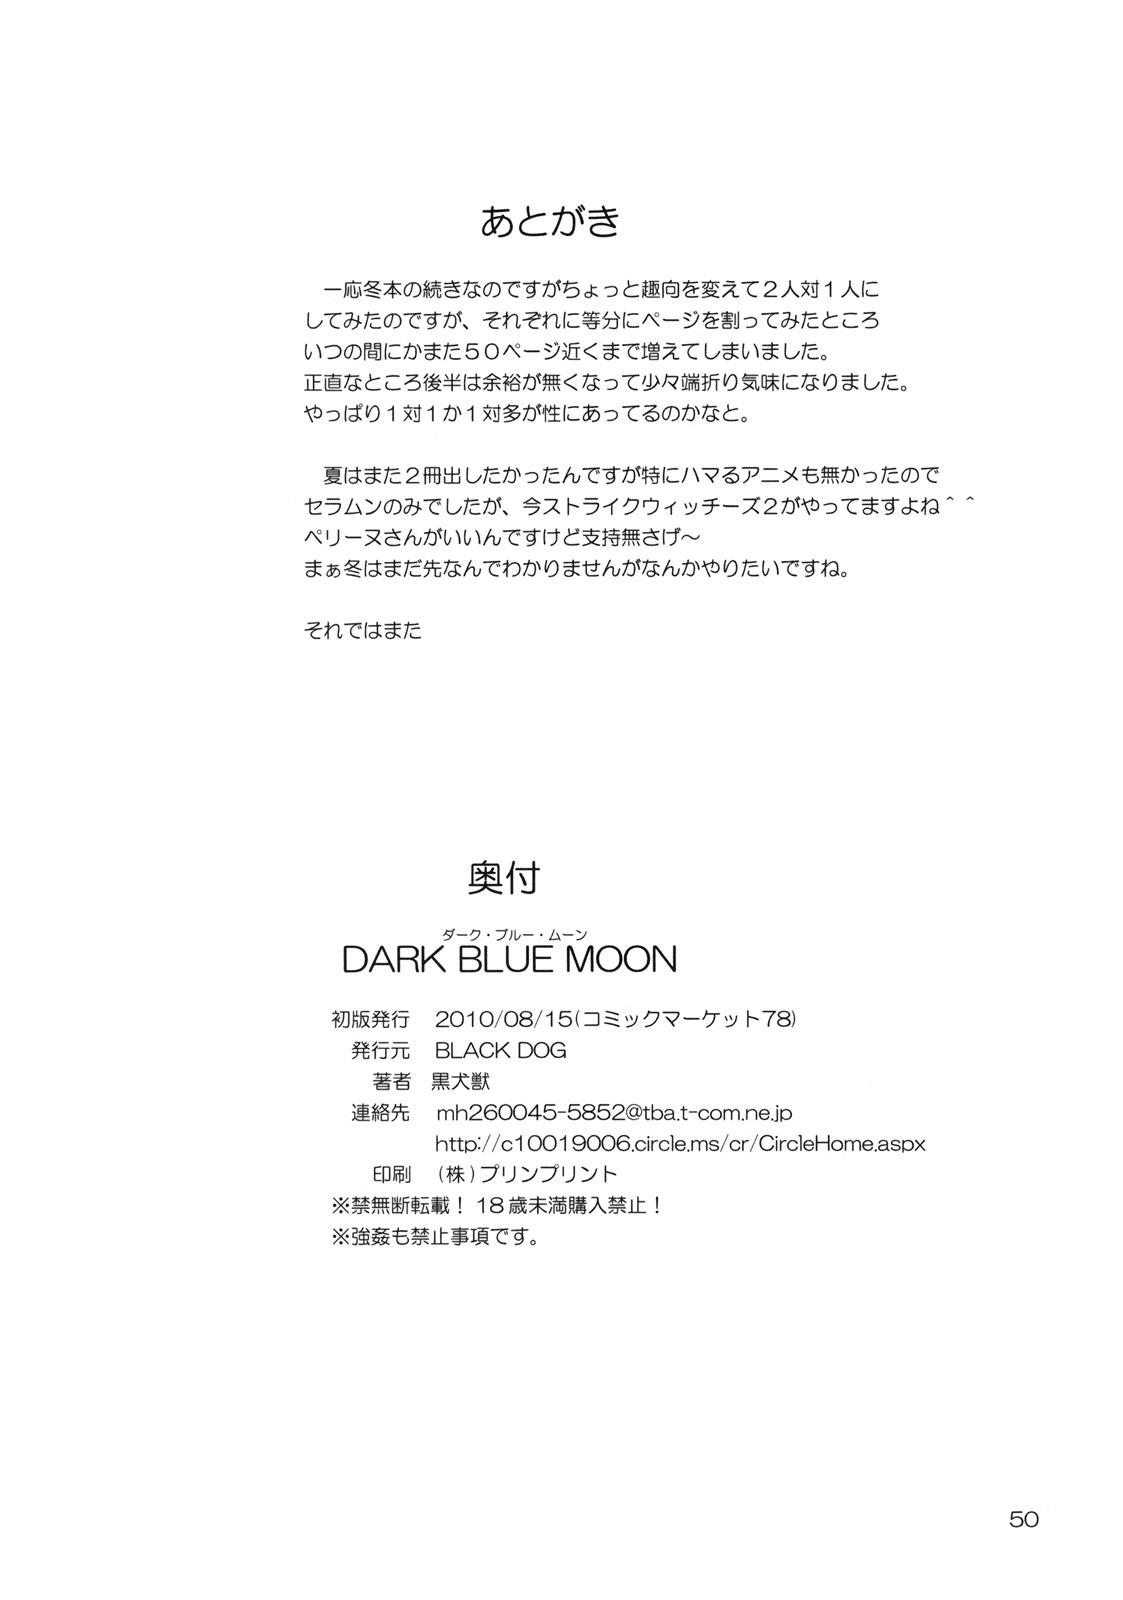 DARK BLUE MOON 48